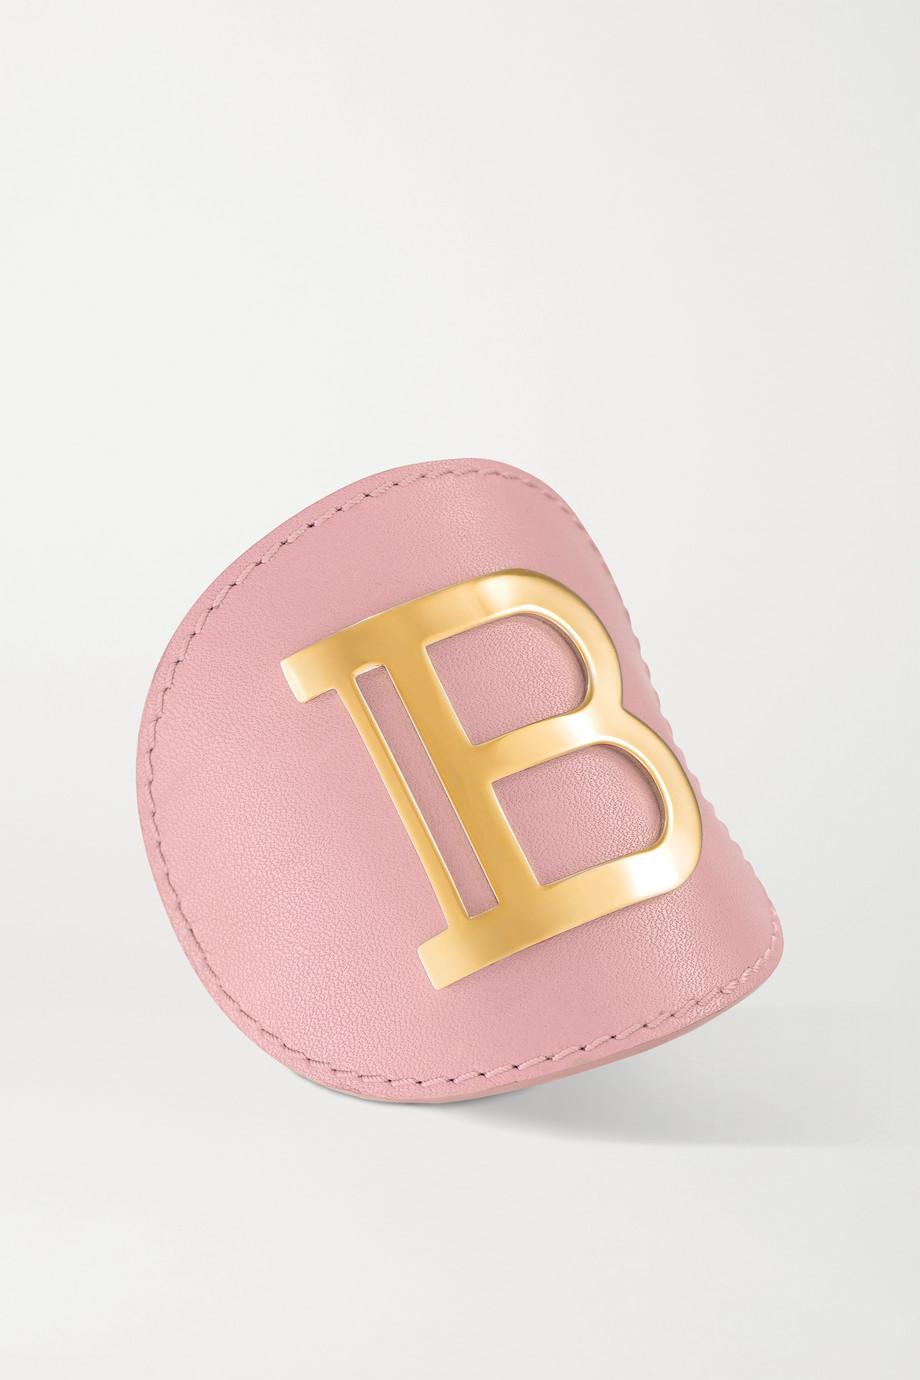 Balmain Paris Hair Couture Haarspange aus Leder mit vergoldetem Detail